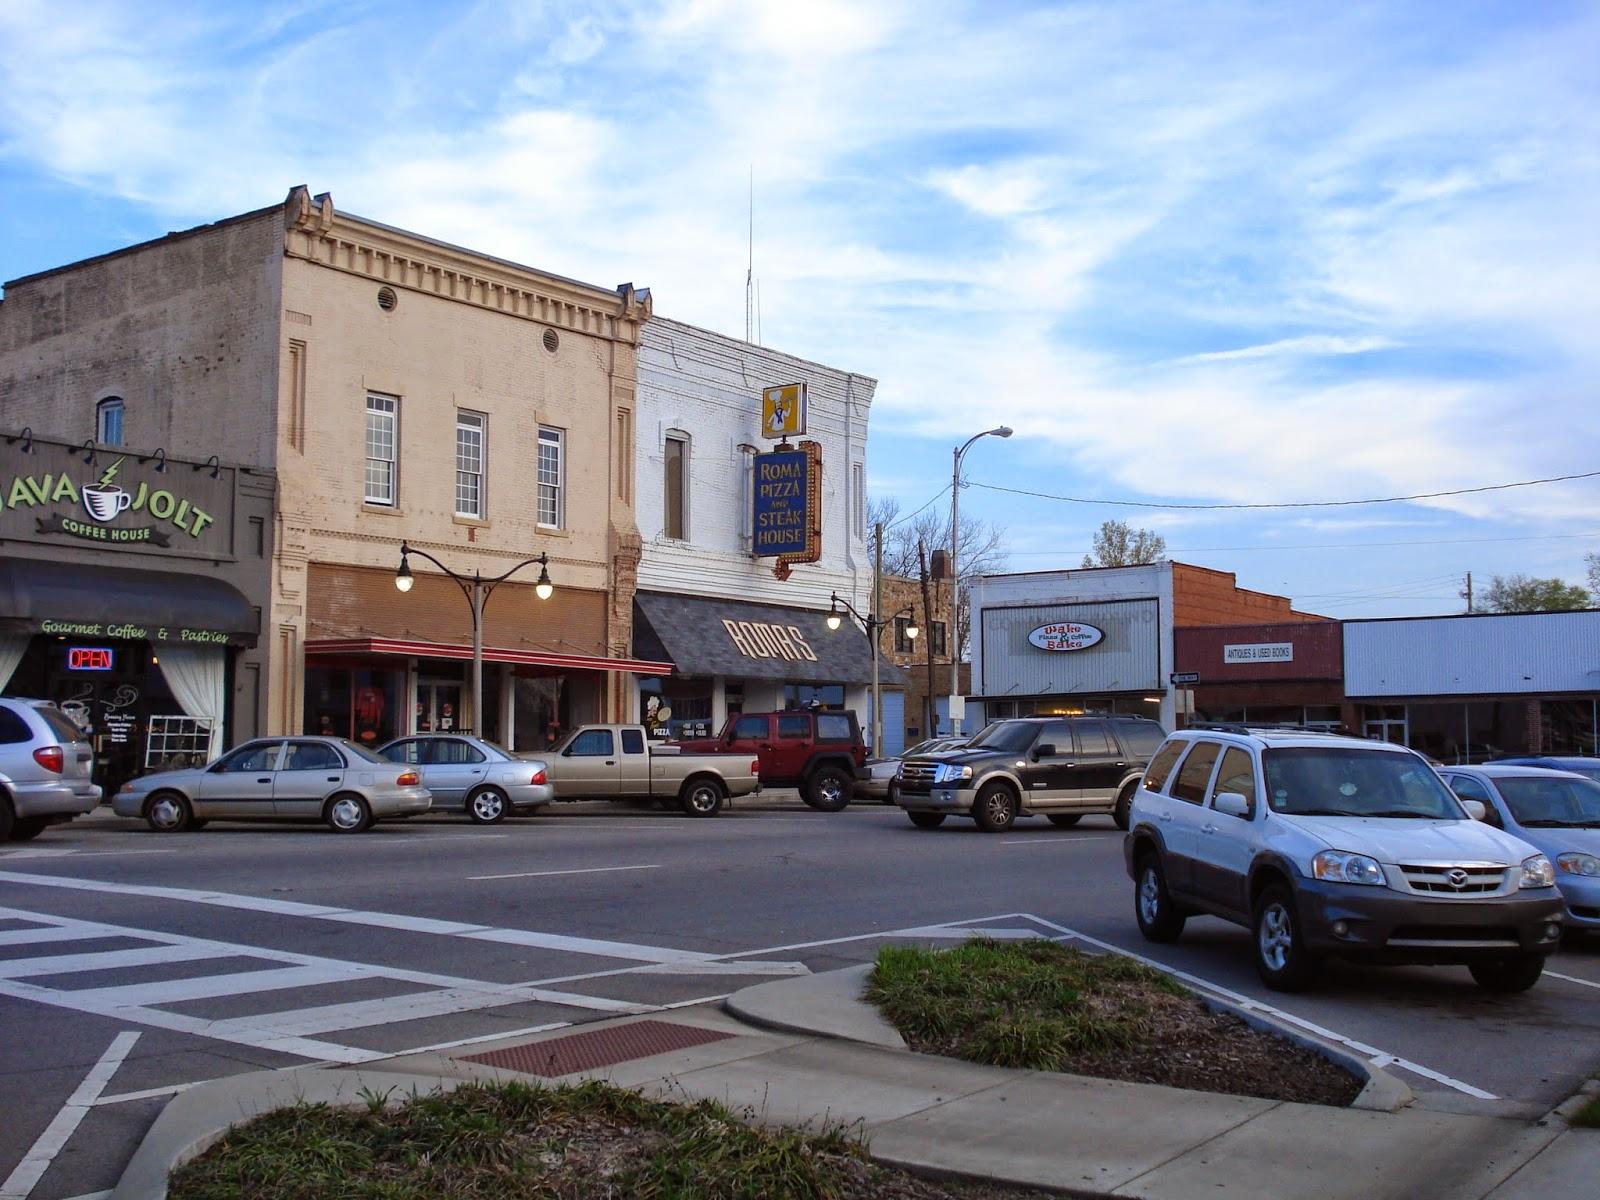 Visit Calhoun County: Gem of the Hills - Jacksonville, Alabama